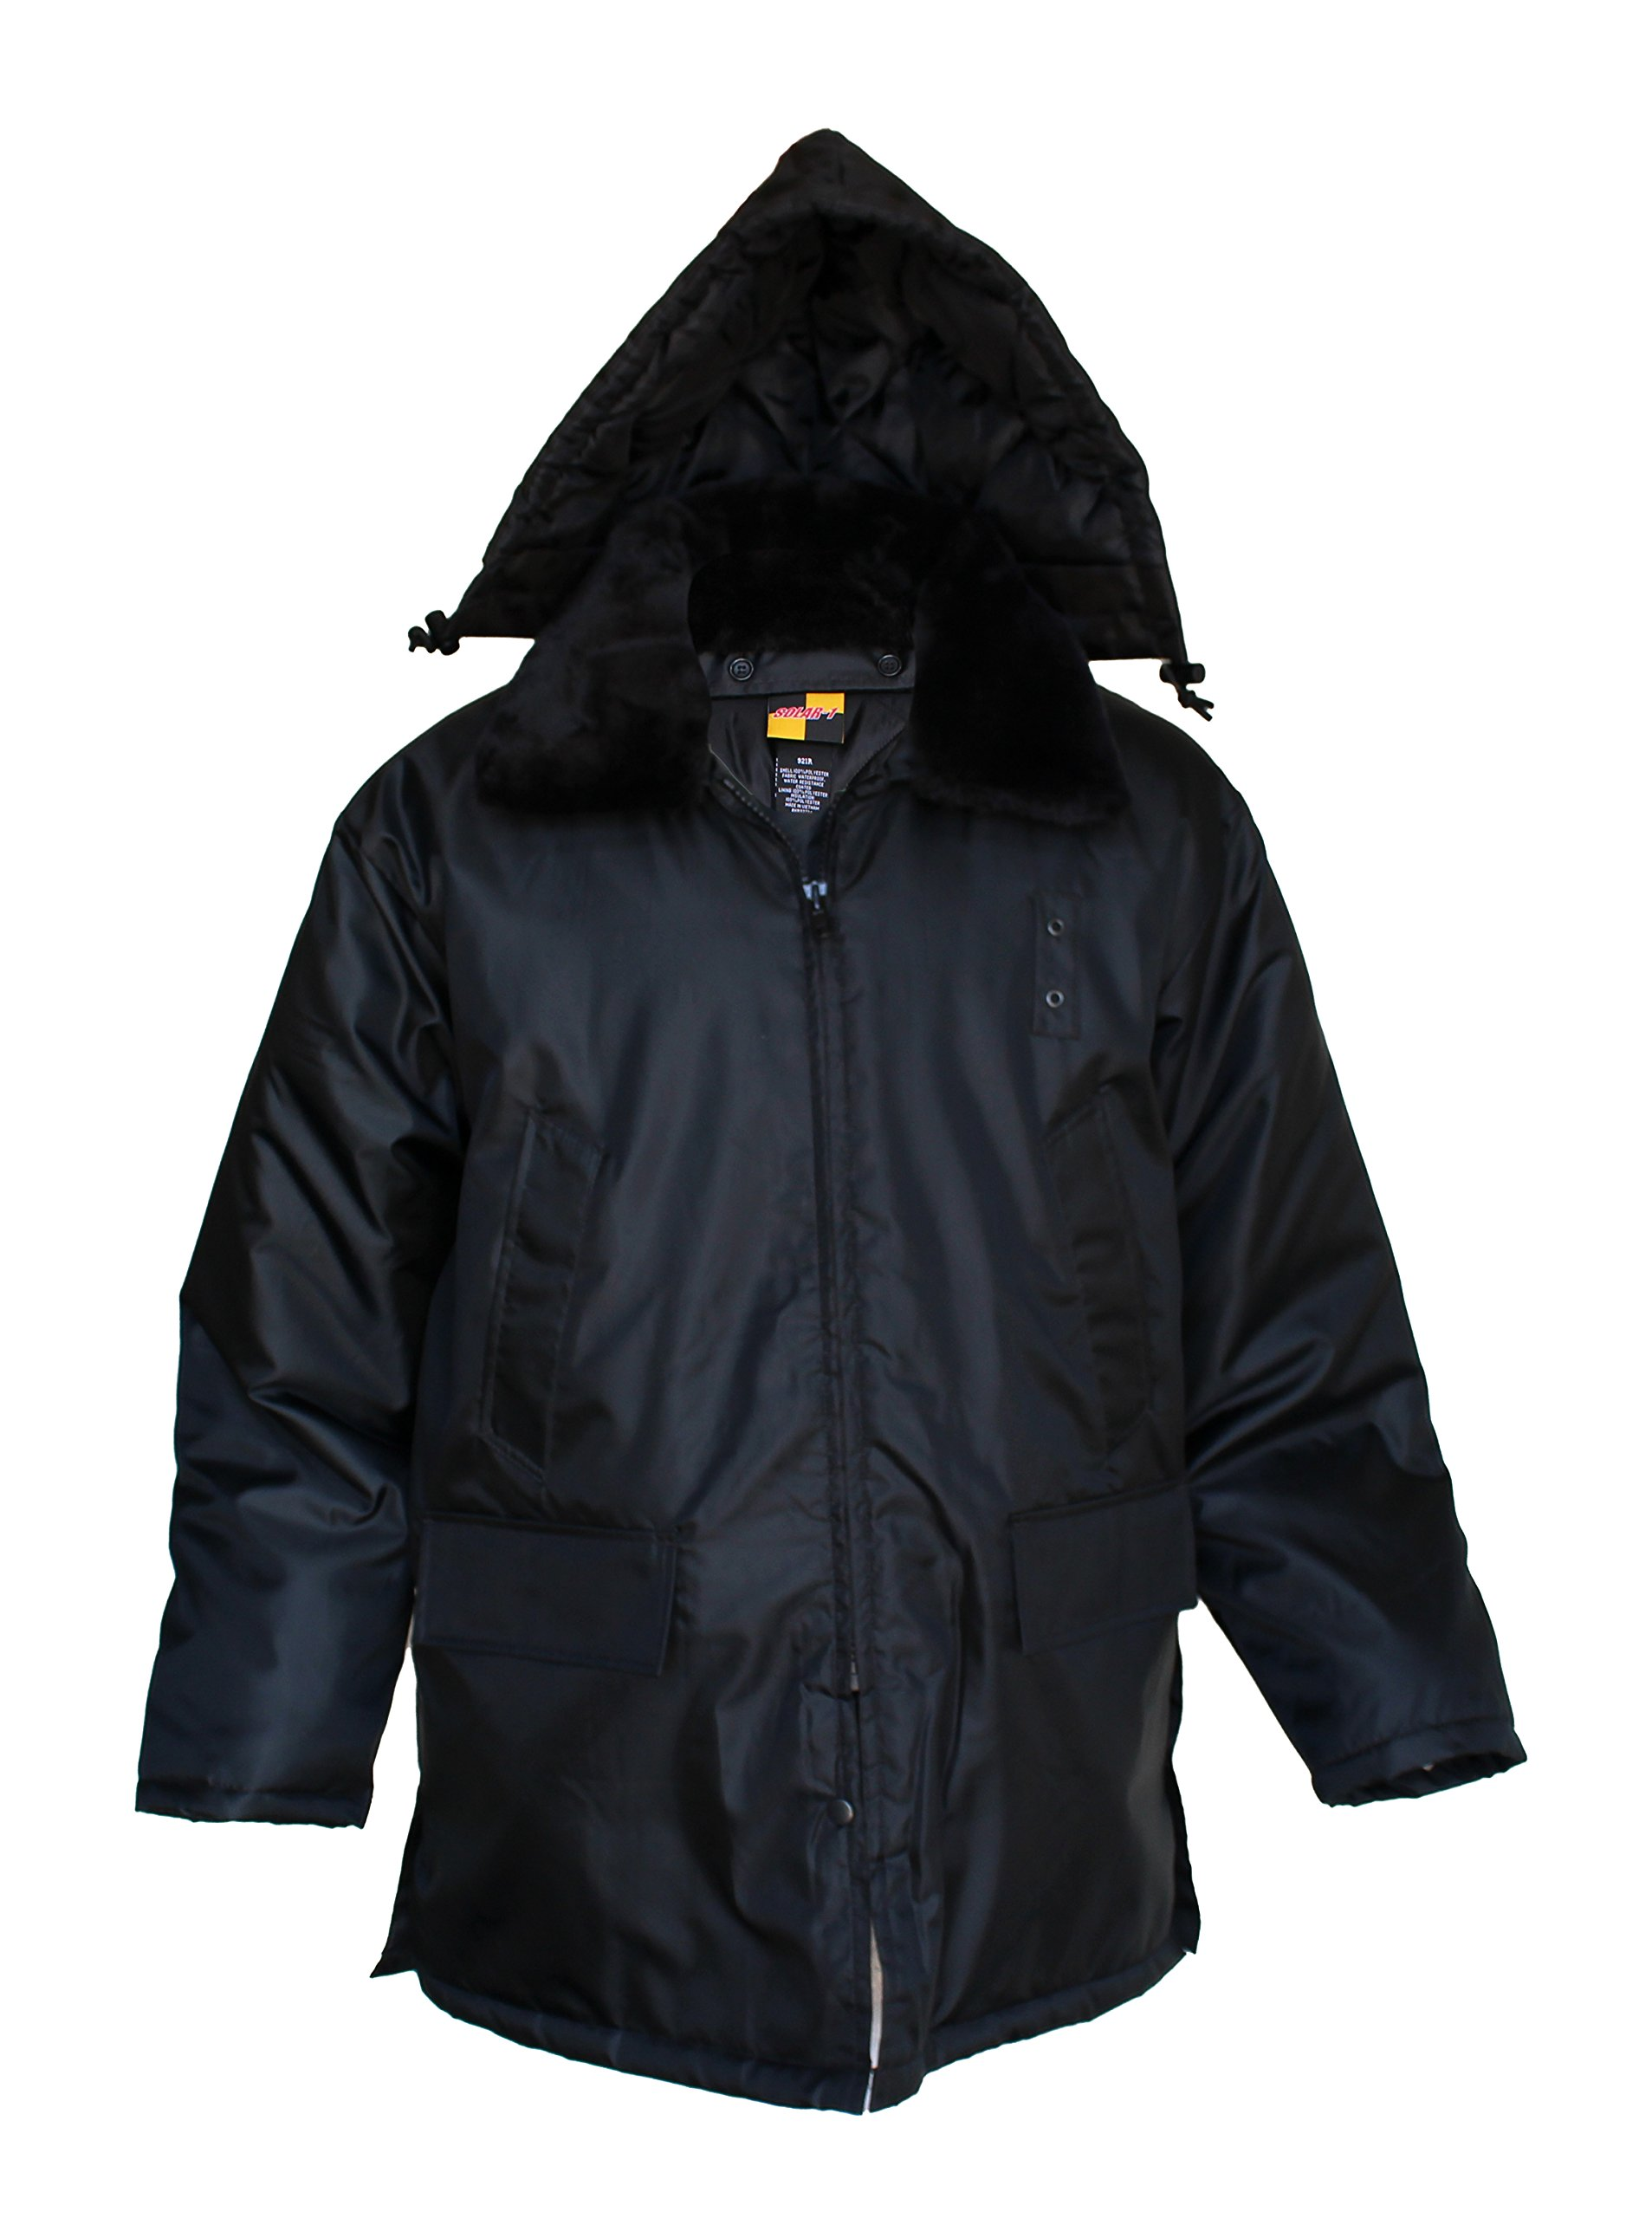 Solar 1 Clothing 921R Nylon Security Parka Duty Jacket, Black, Medium